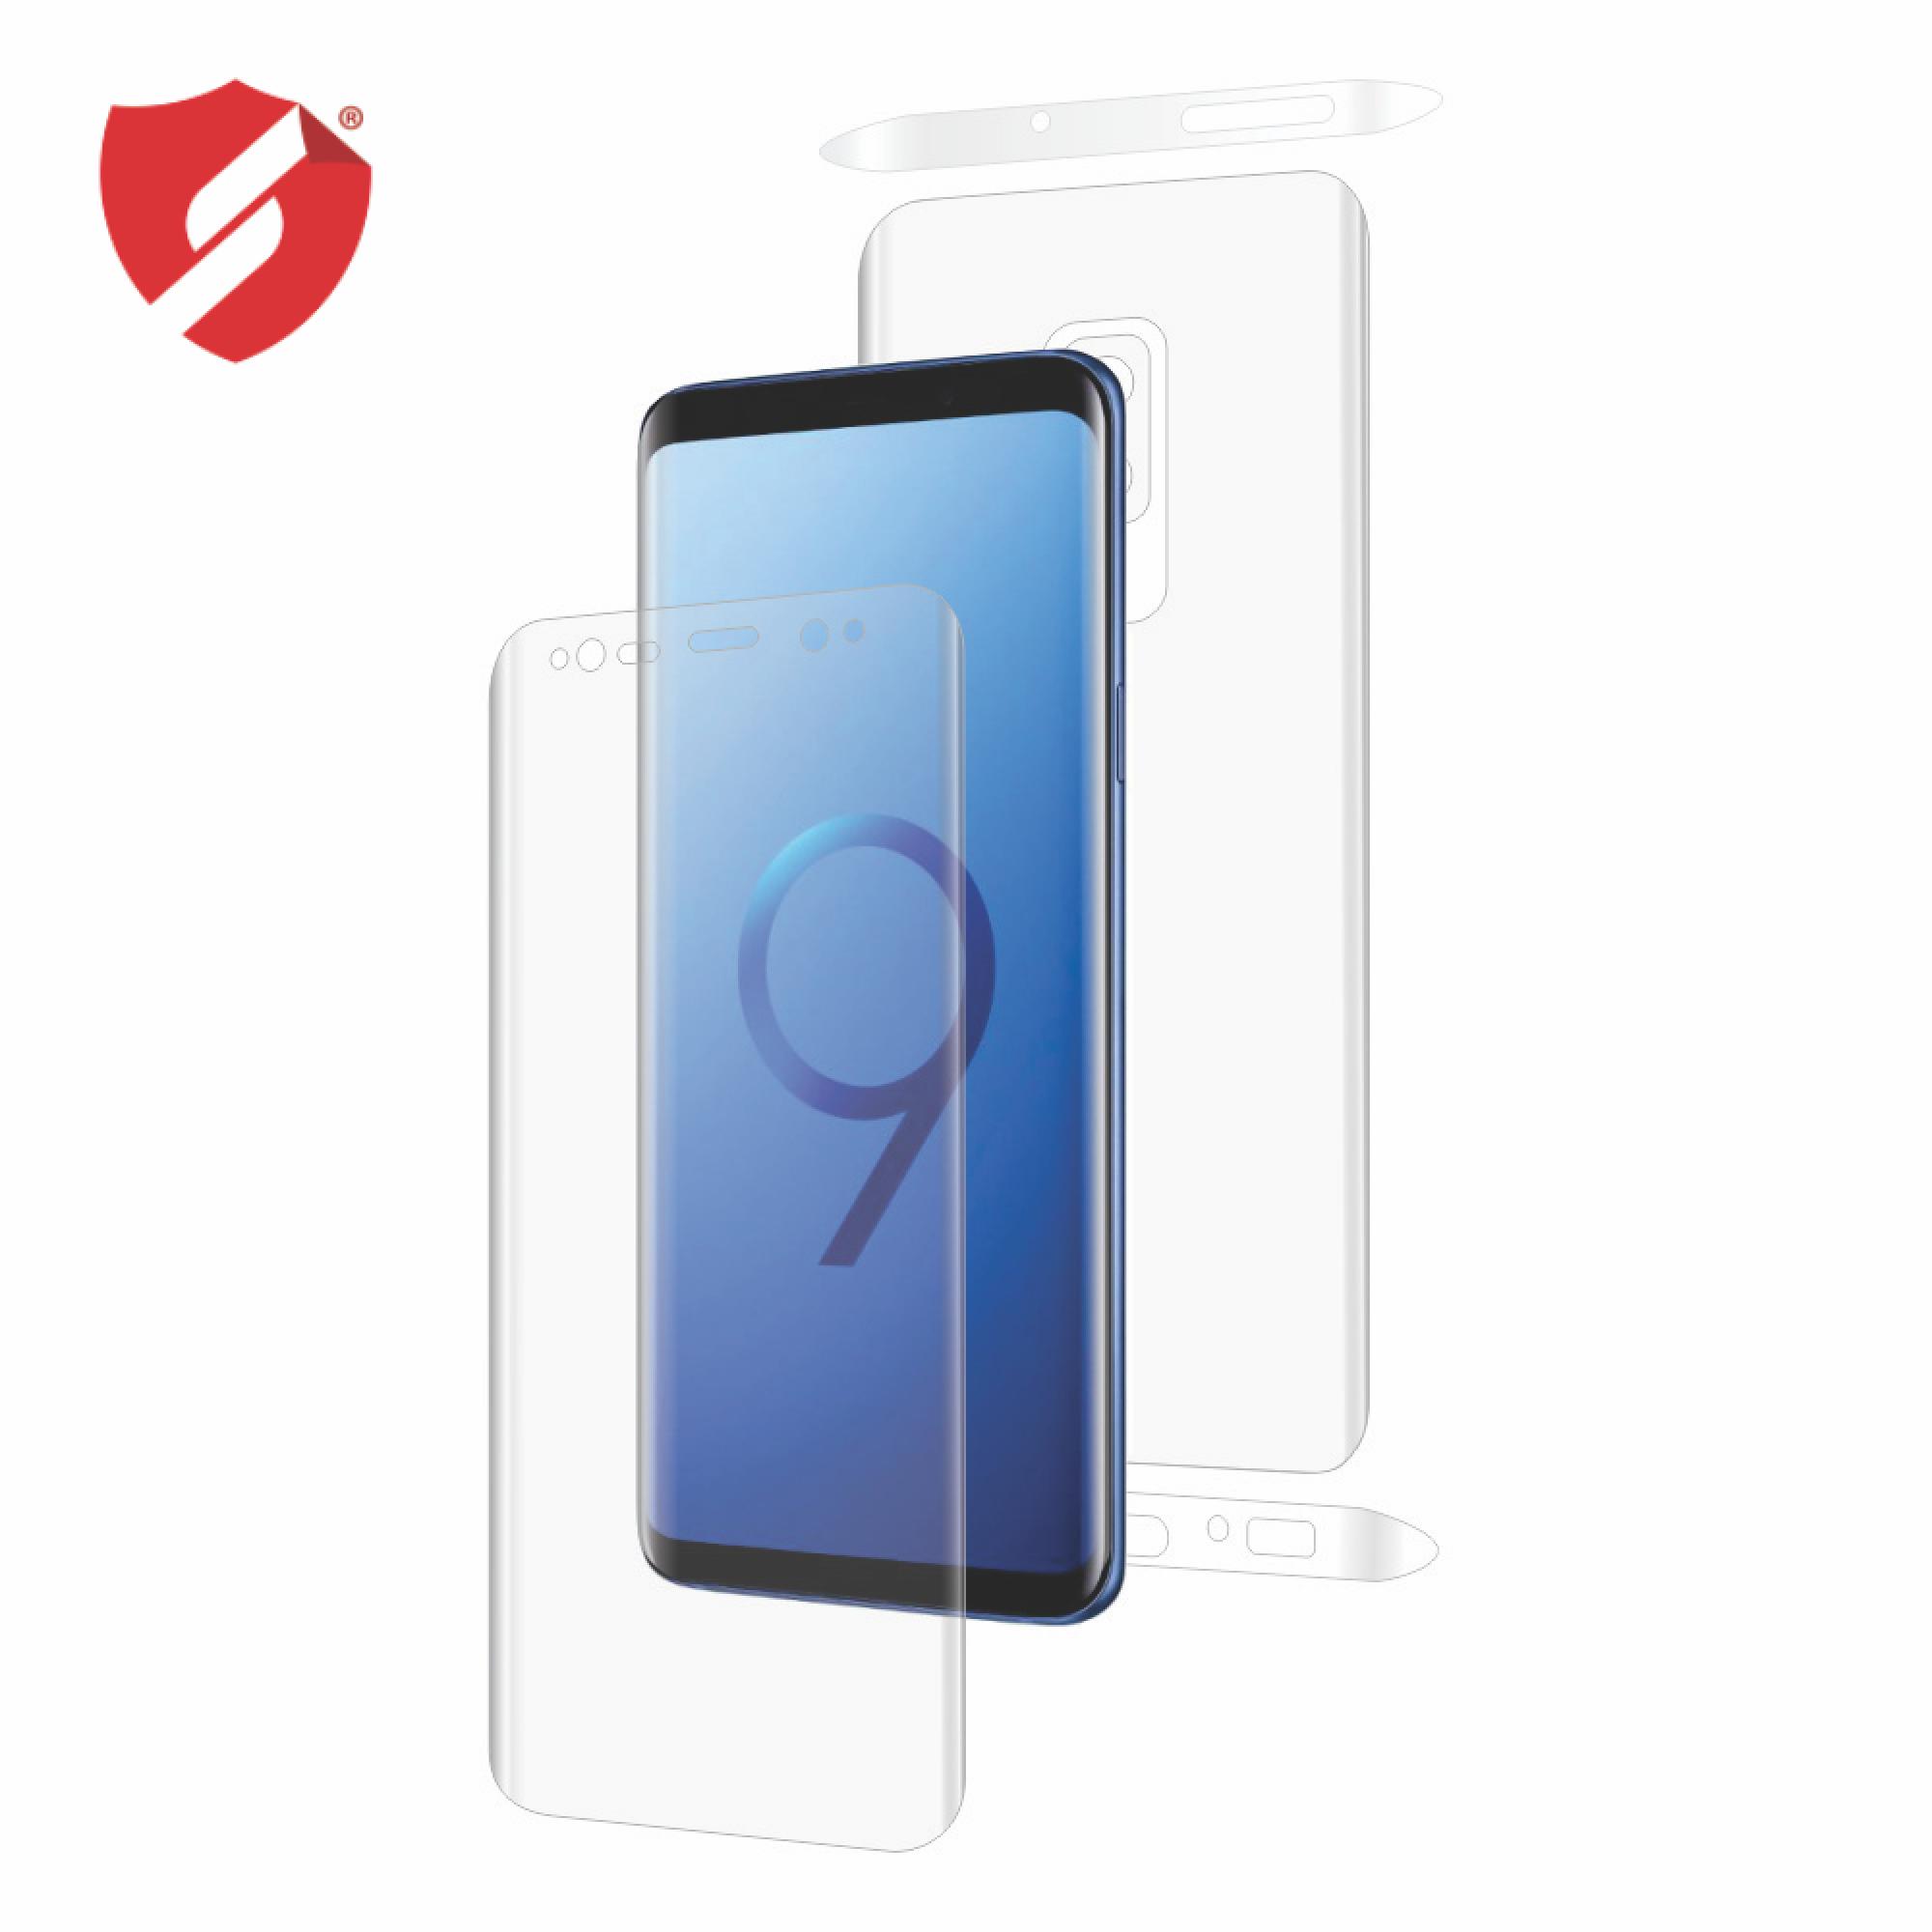 Folie de protectie Smart Protection Samsung Galaxy S9 Plus compatibila cu carcasa Samsung Silicone Cover - fullbody - display + spate + laterale imagine